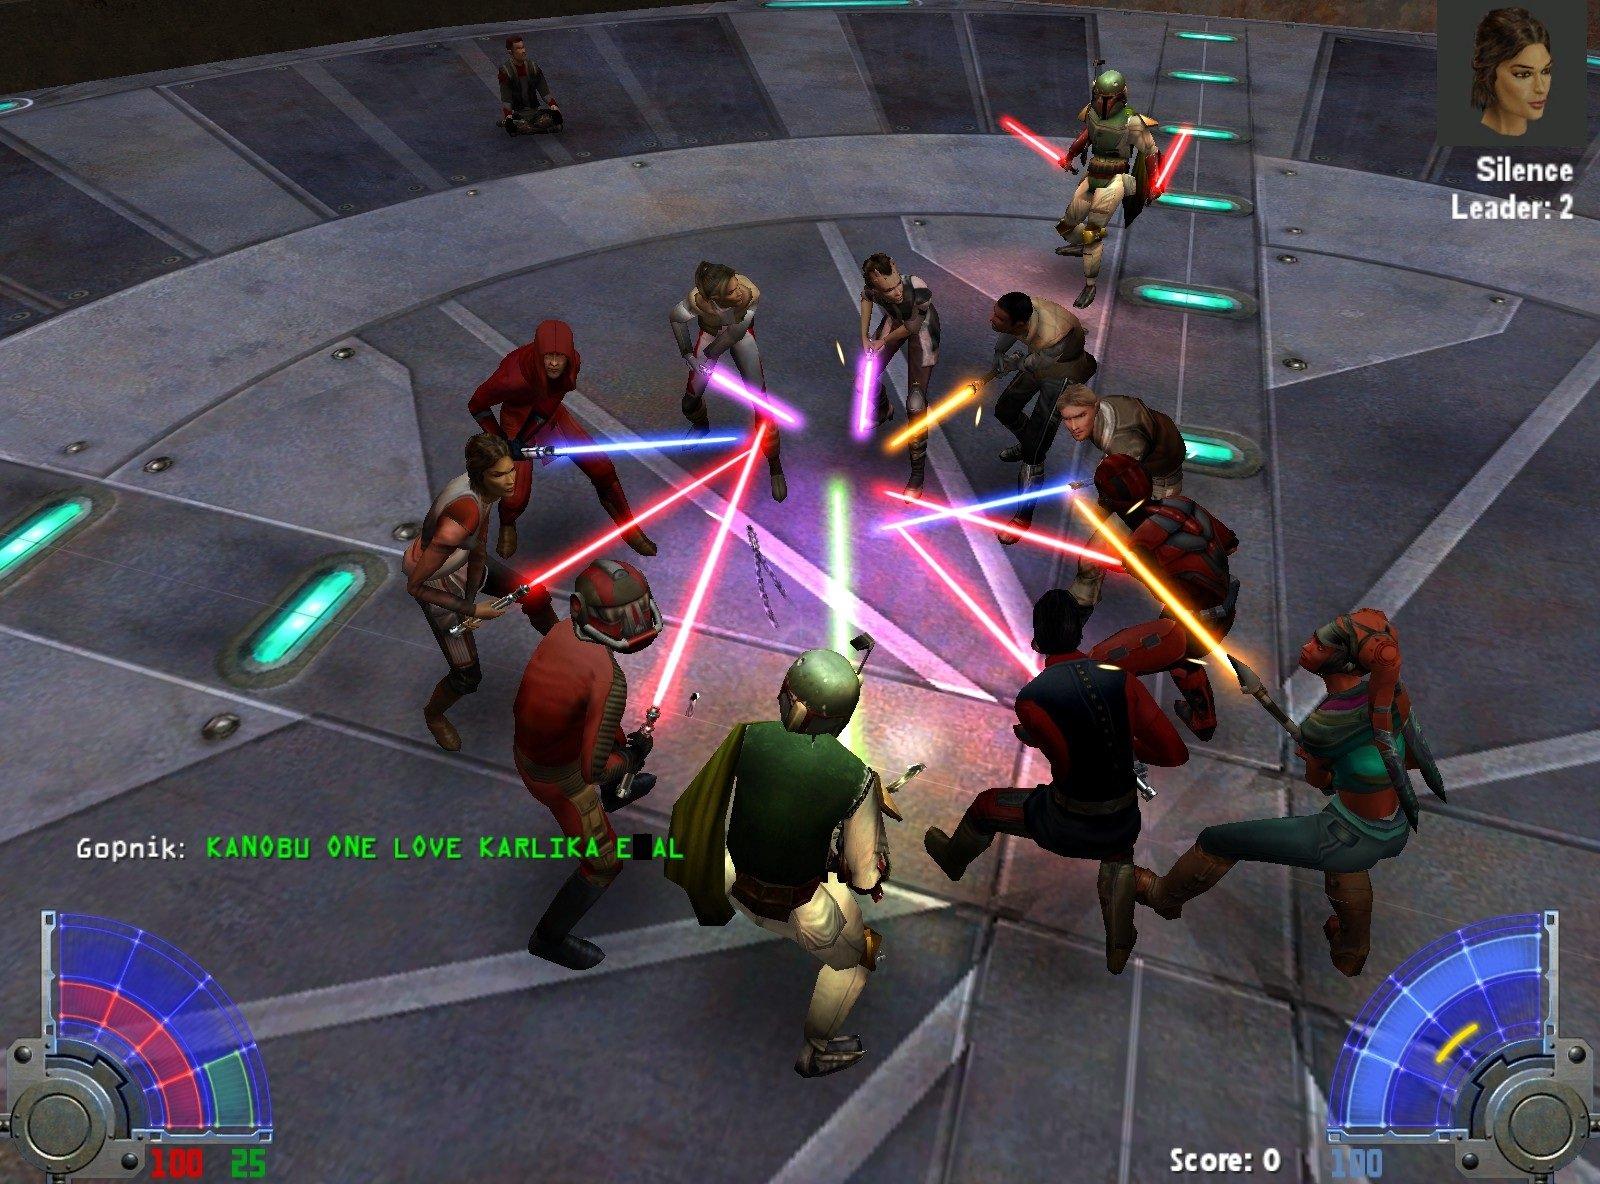 Мультиплеер Star Wars Jedi Knight: Jedi Academy - день 1. - Изображение 3